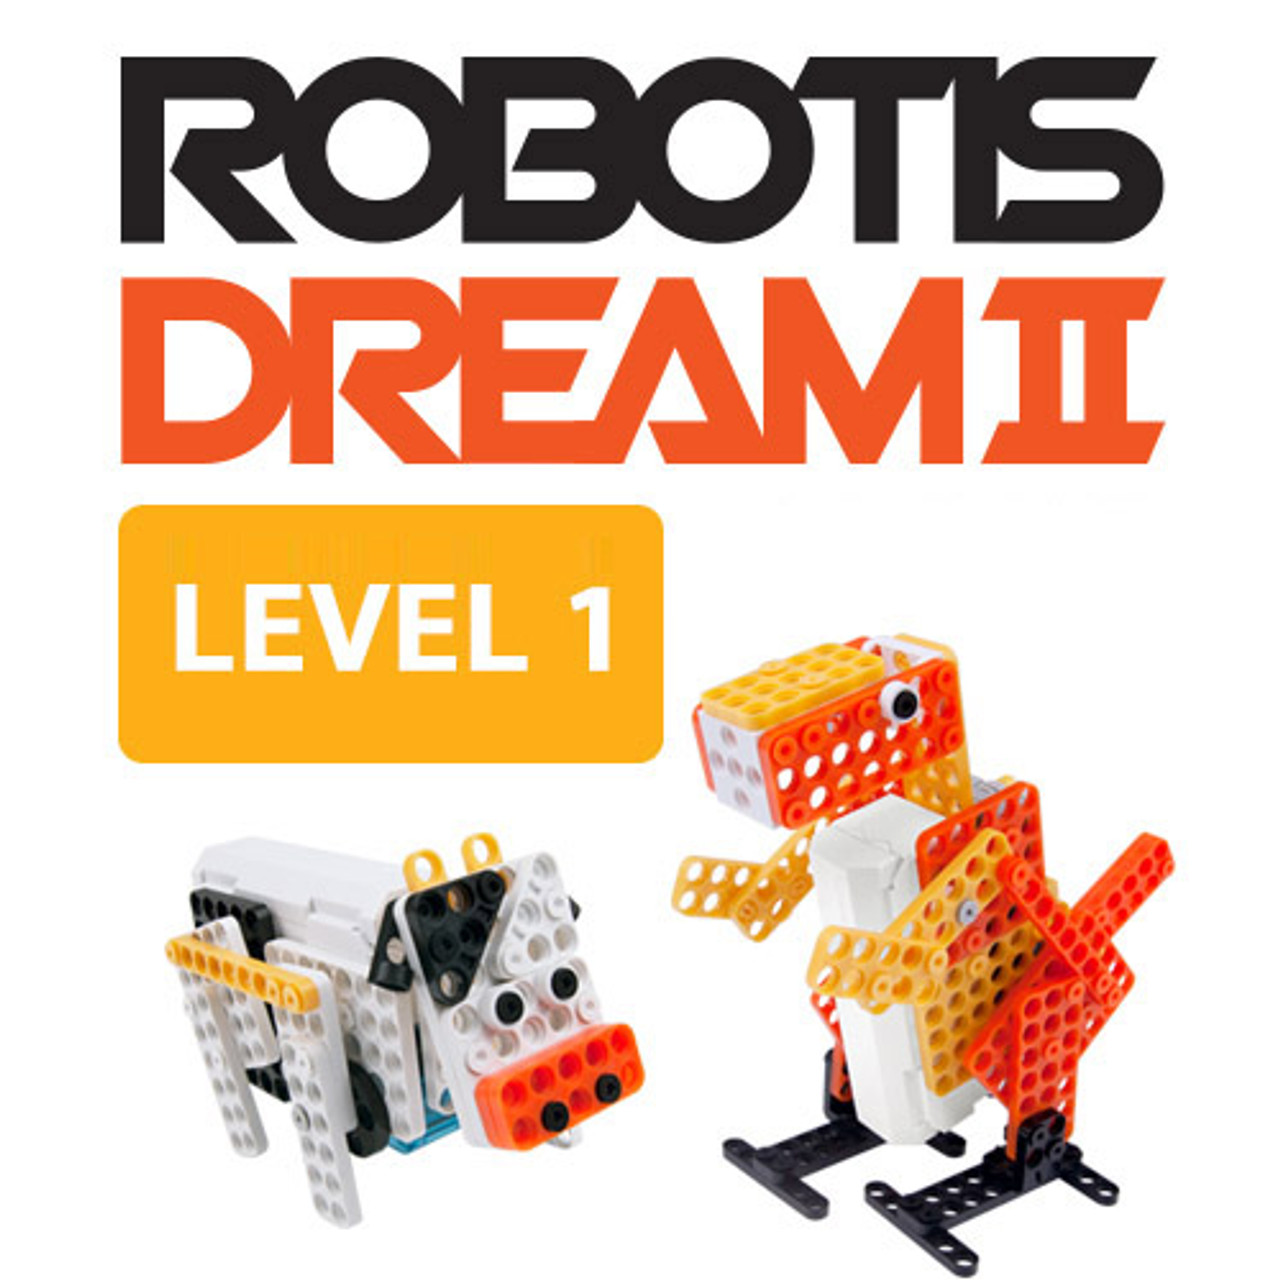 DREAM II Level 1